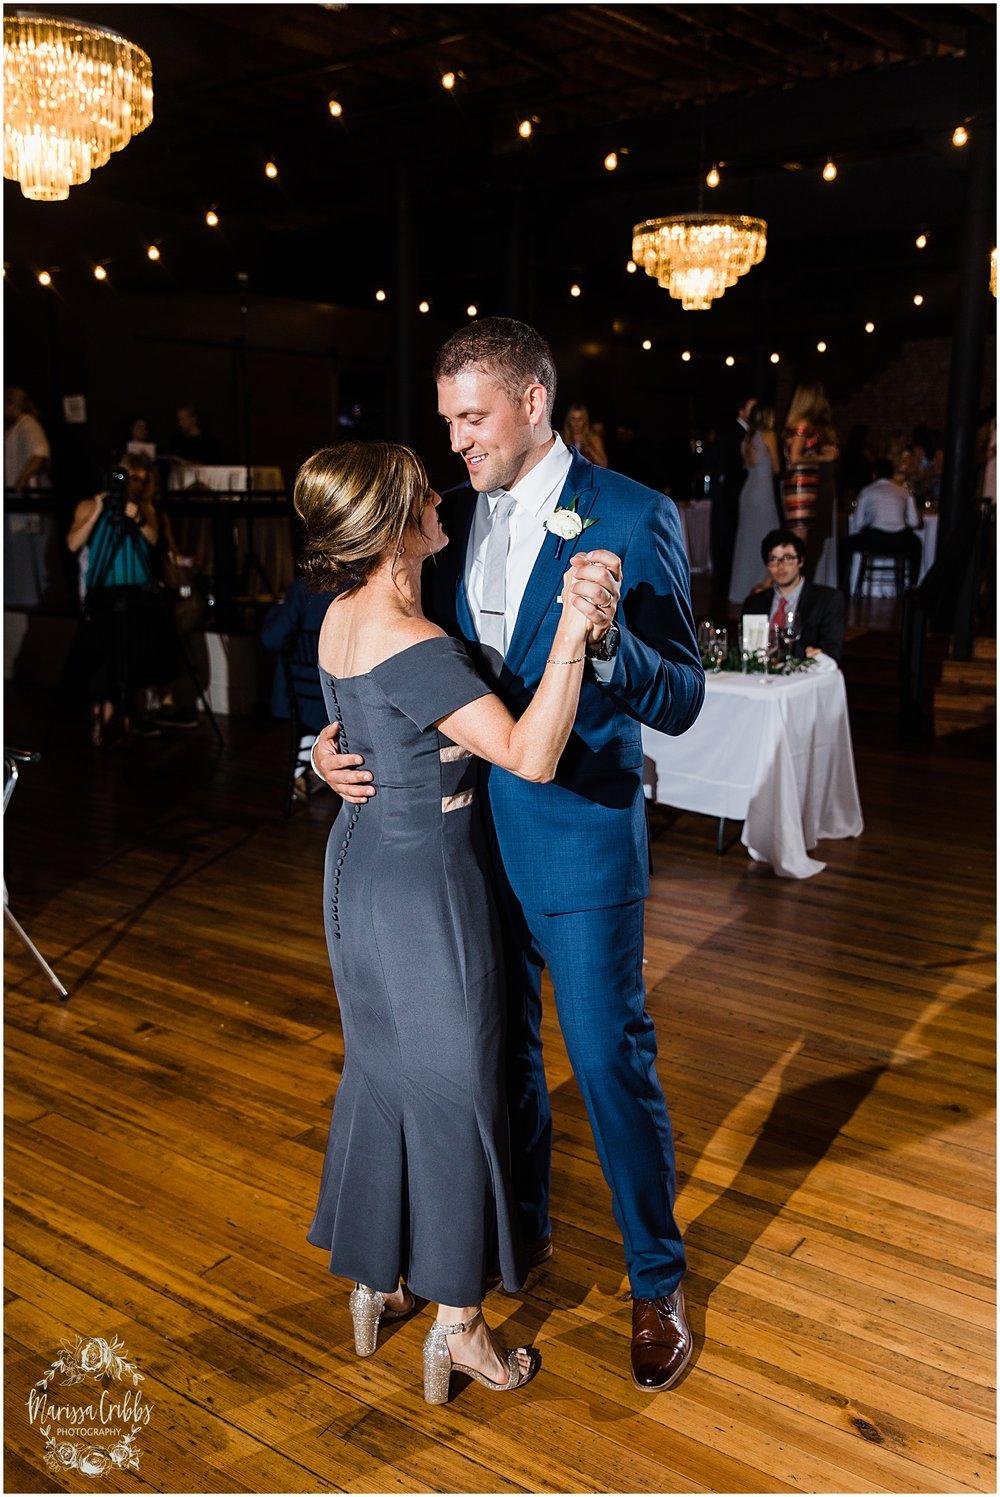 MAGNOLIA VENUE WEDDING | CHARLIE & NATALIE | MARISSA CRIBBS PHOTOGRAPHY_5804.jpg